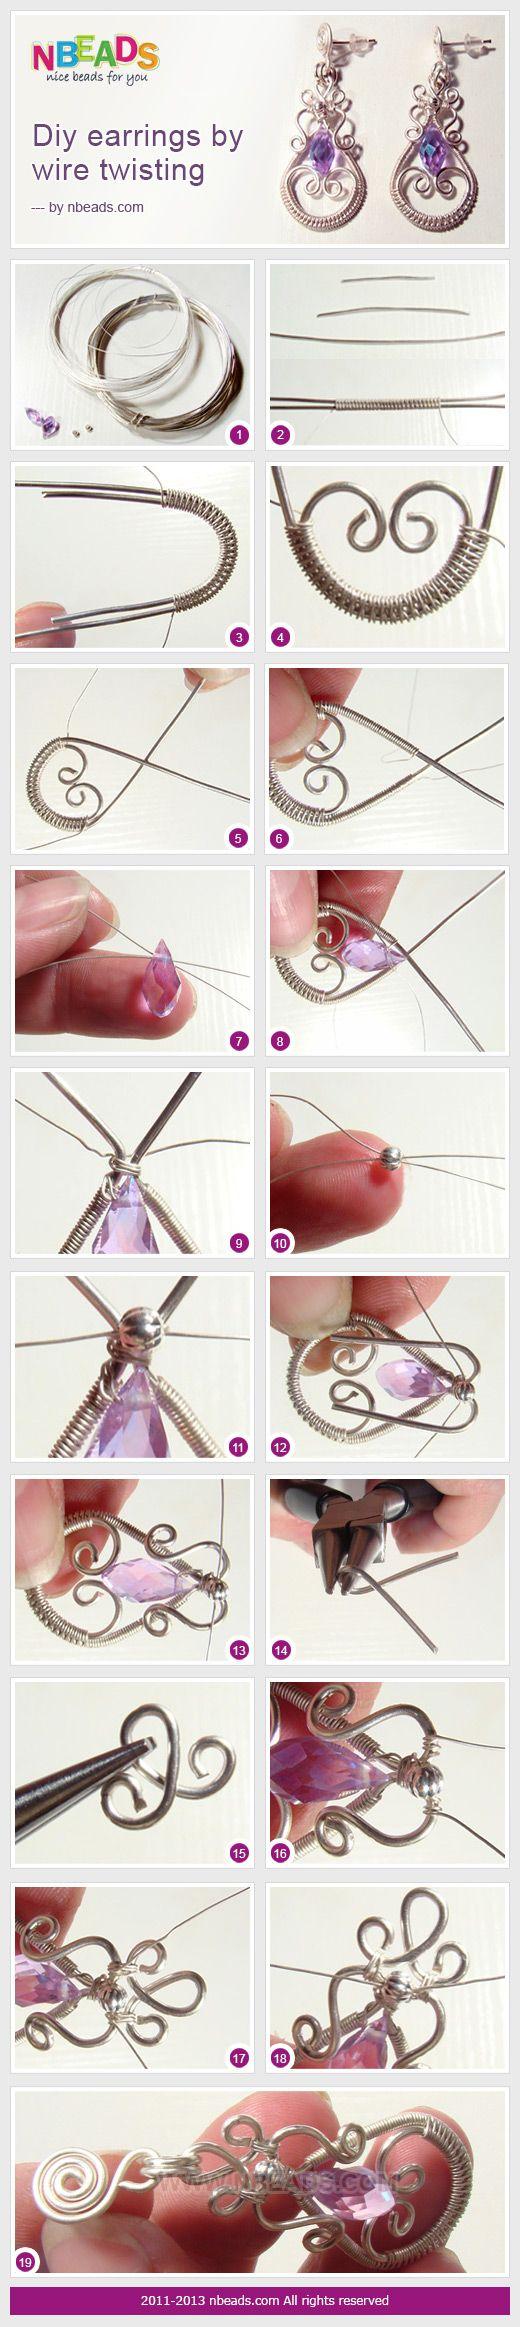 diy earrings by wire twisting